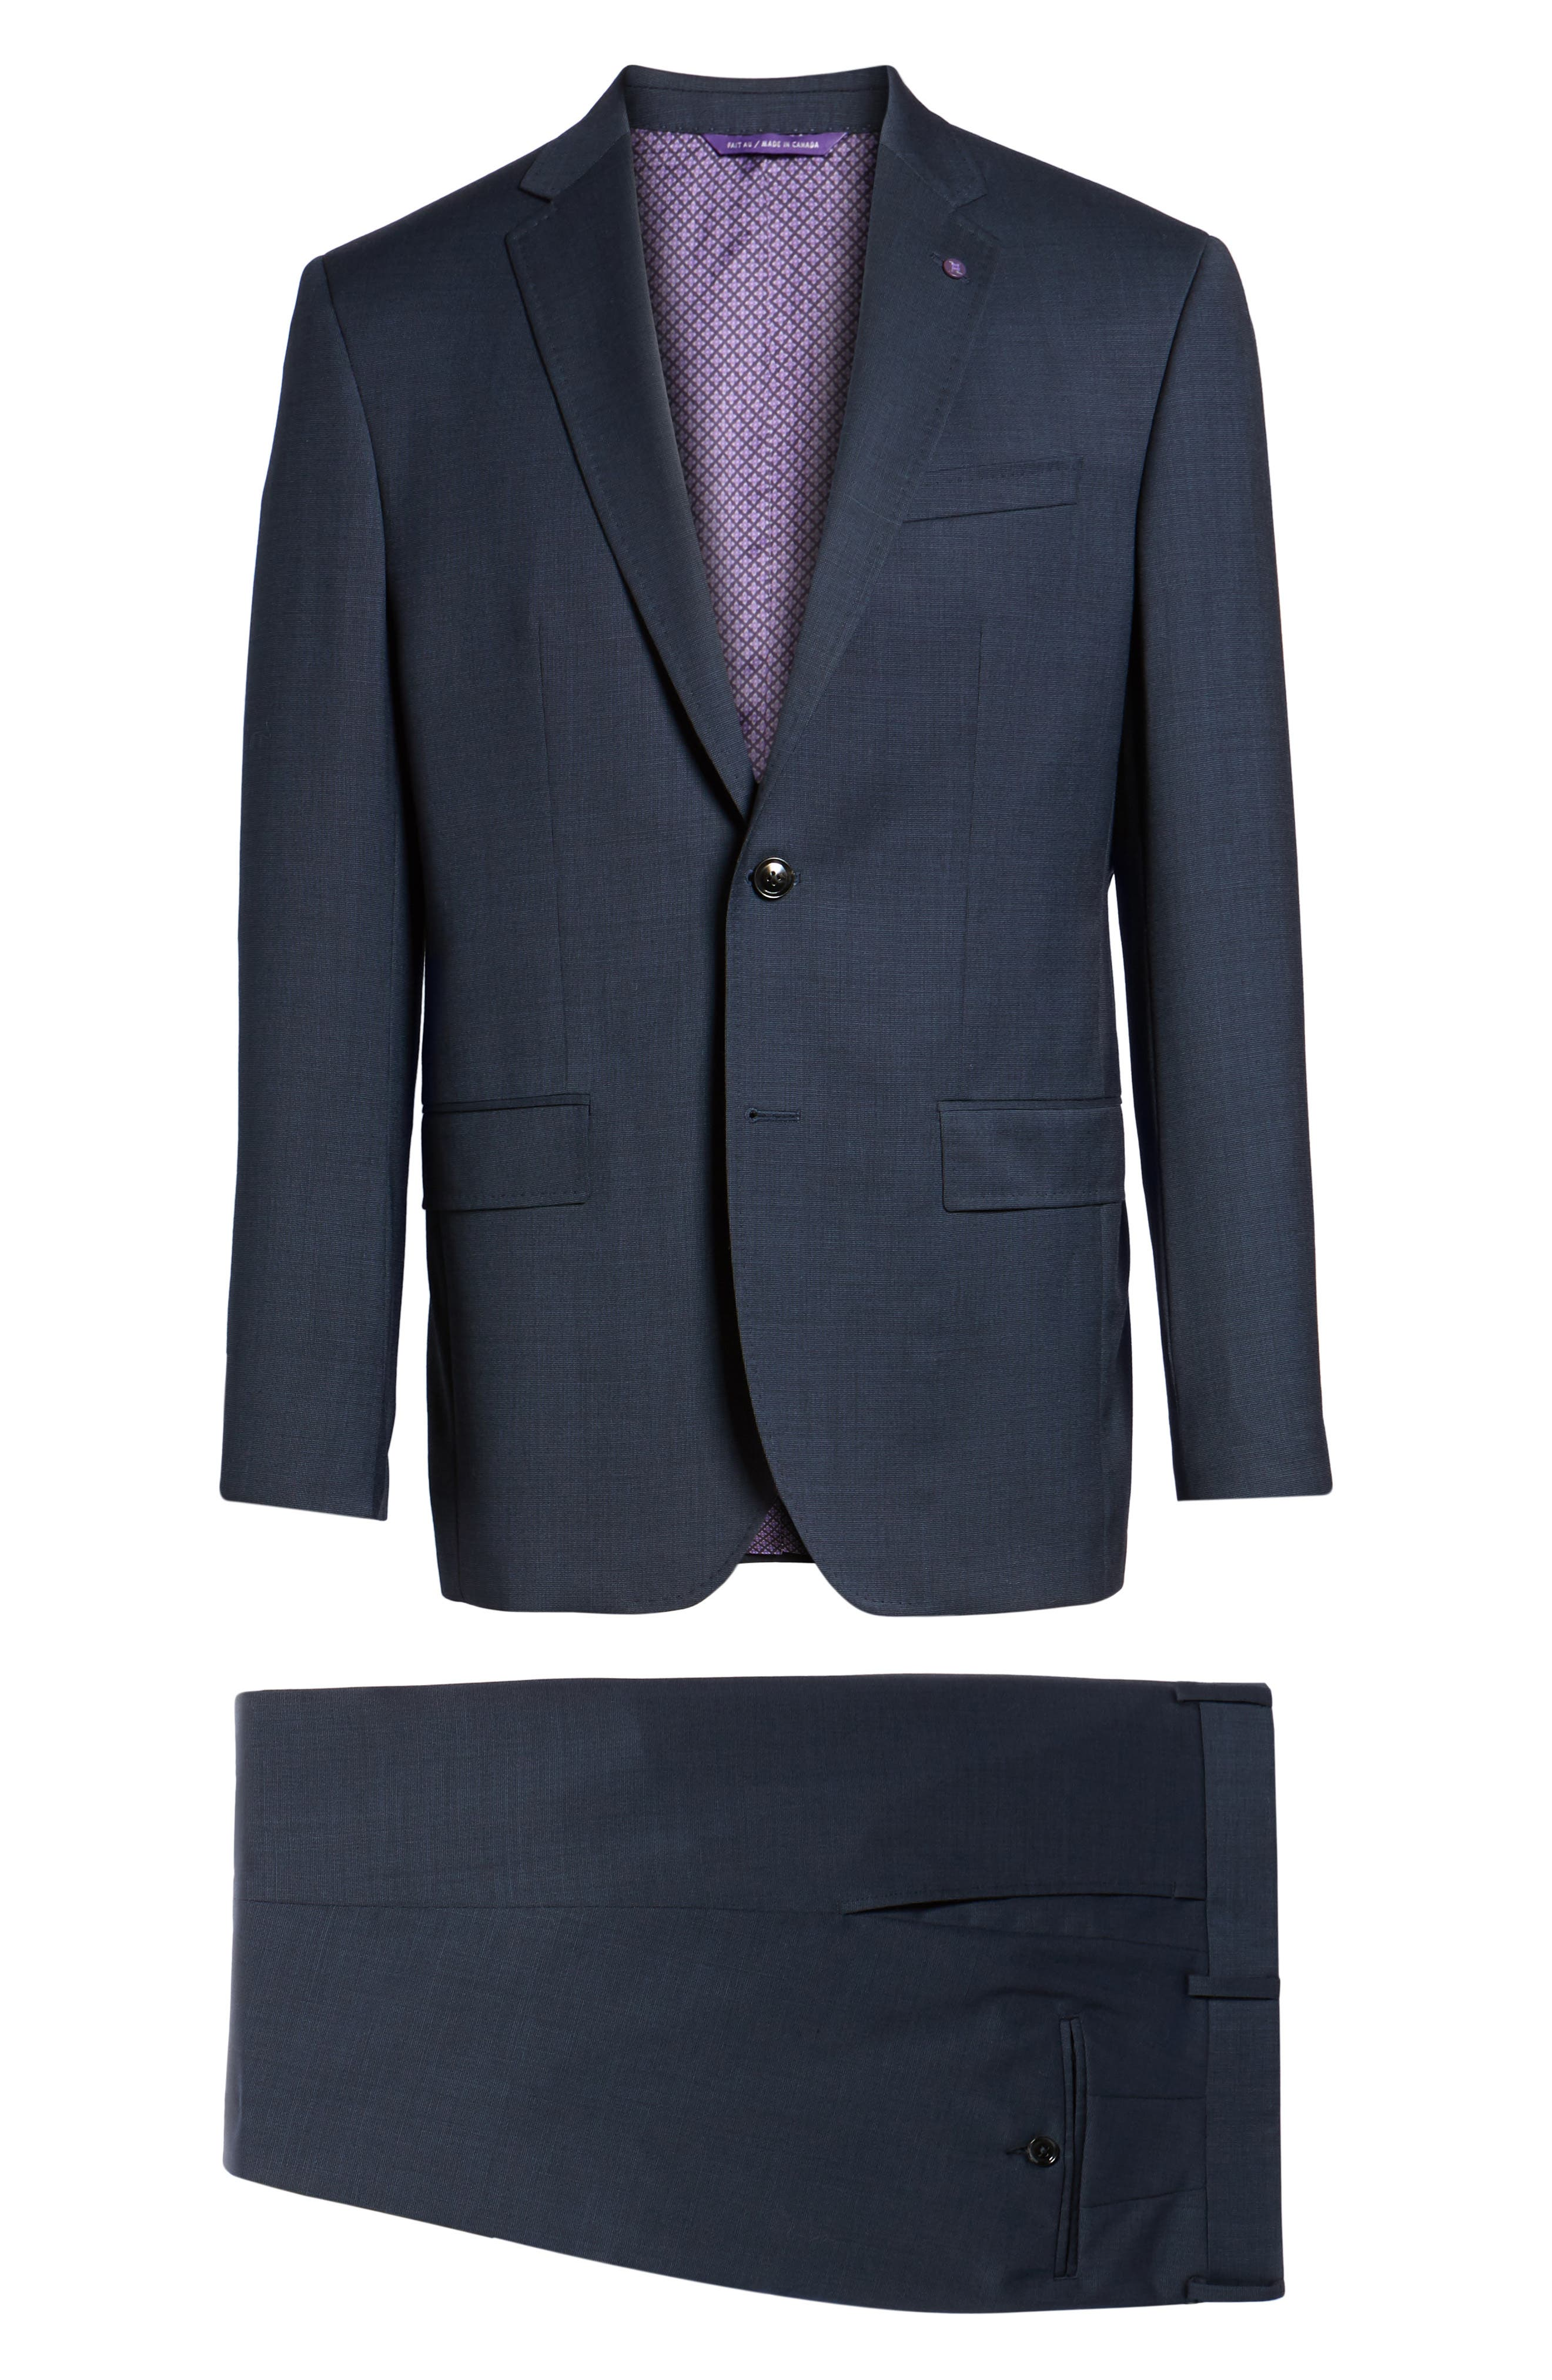 Jay Trim Fit Solid Wool Suit,                             Alternate thumbnail 8, color,                             400